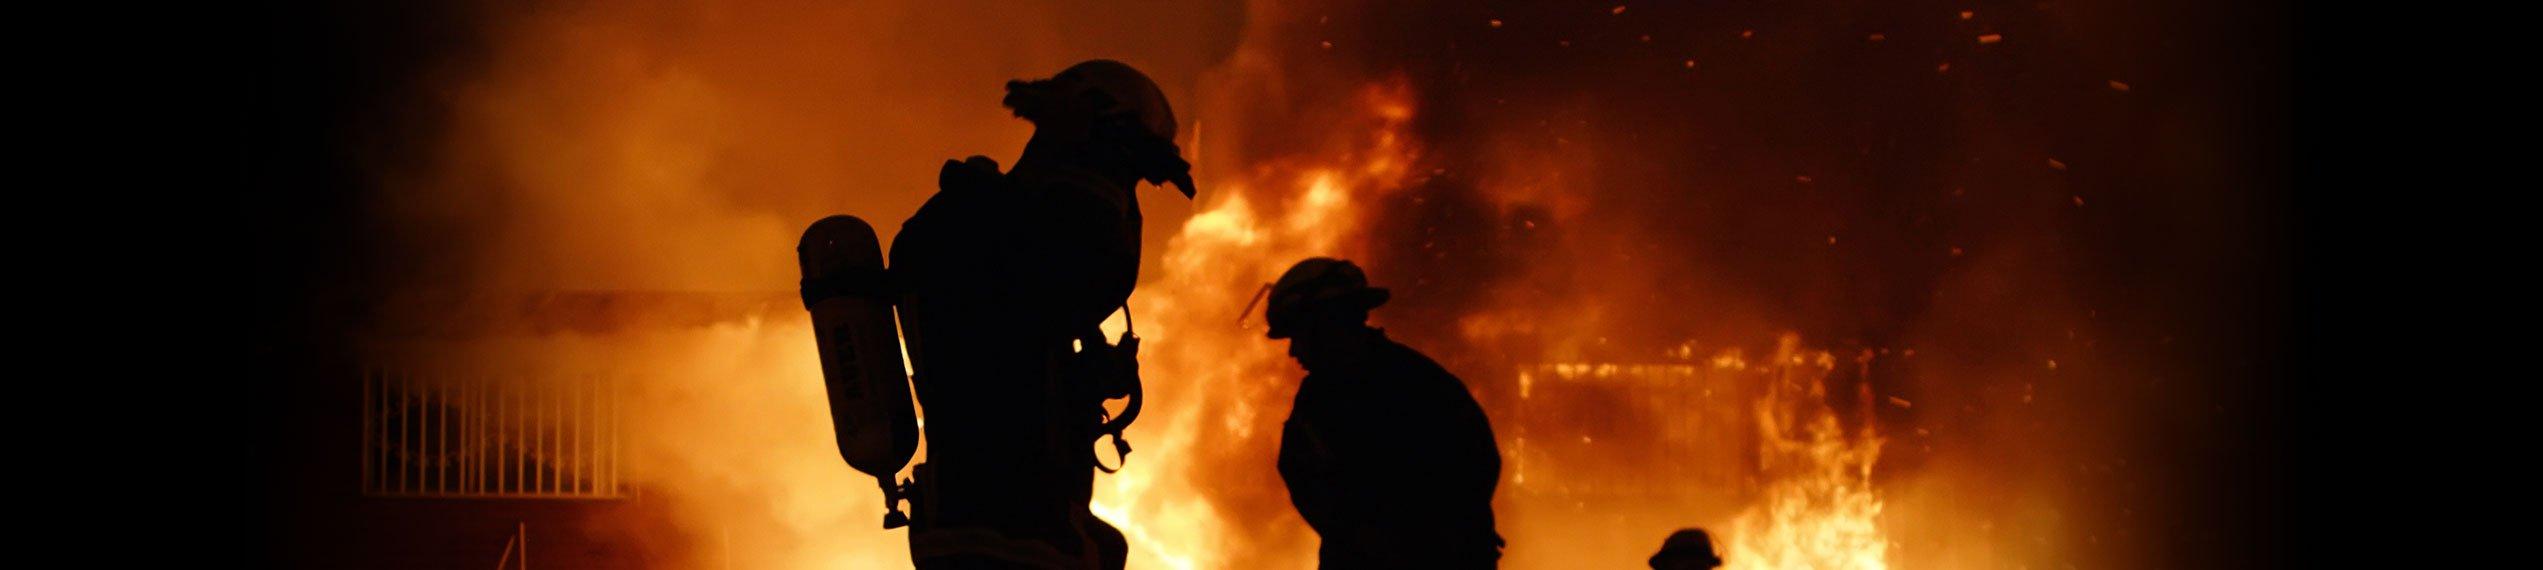 Fire & Smoke Damage Removal in Paul Davis Restoration of Southern New Jersey